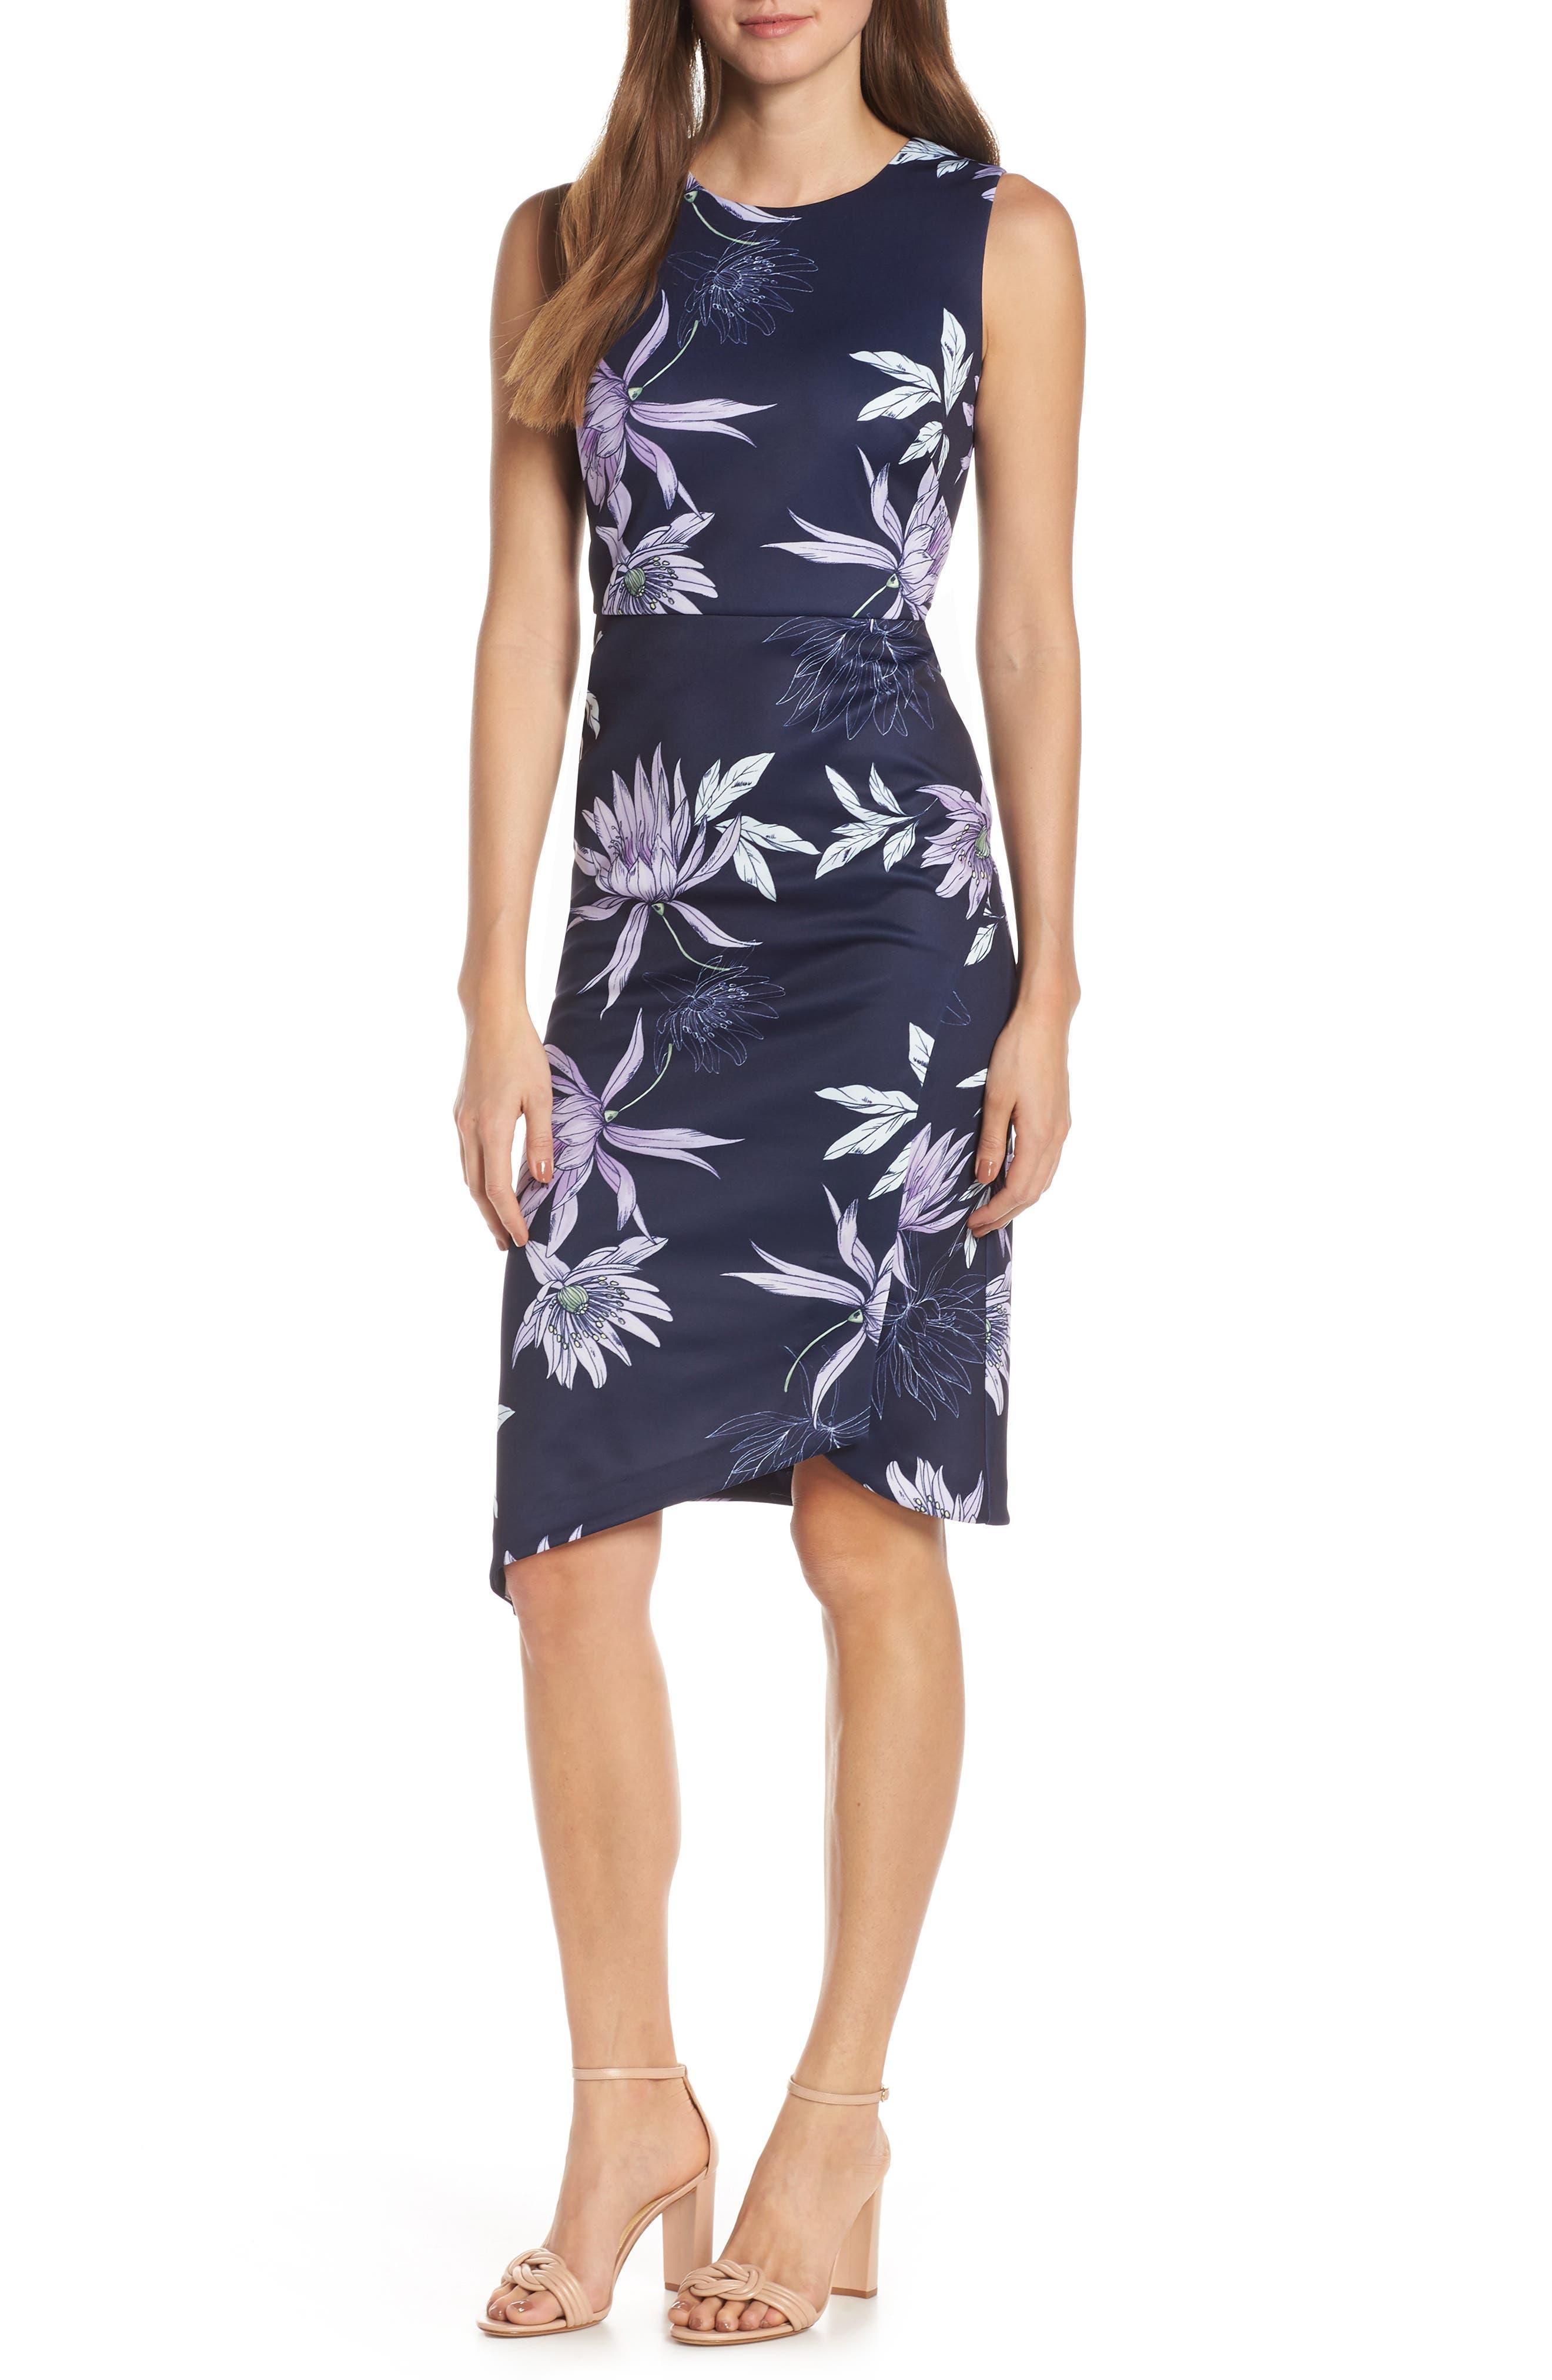 VINCE CAMUTO Floral Print Asymmetrical Hem Dress, Main, color, NAVY/ MULTI